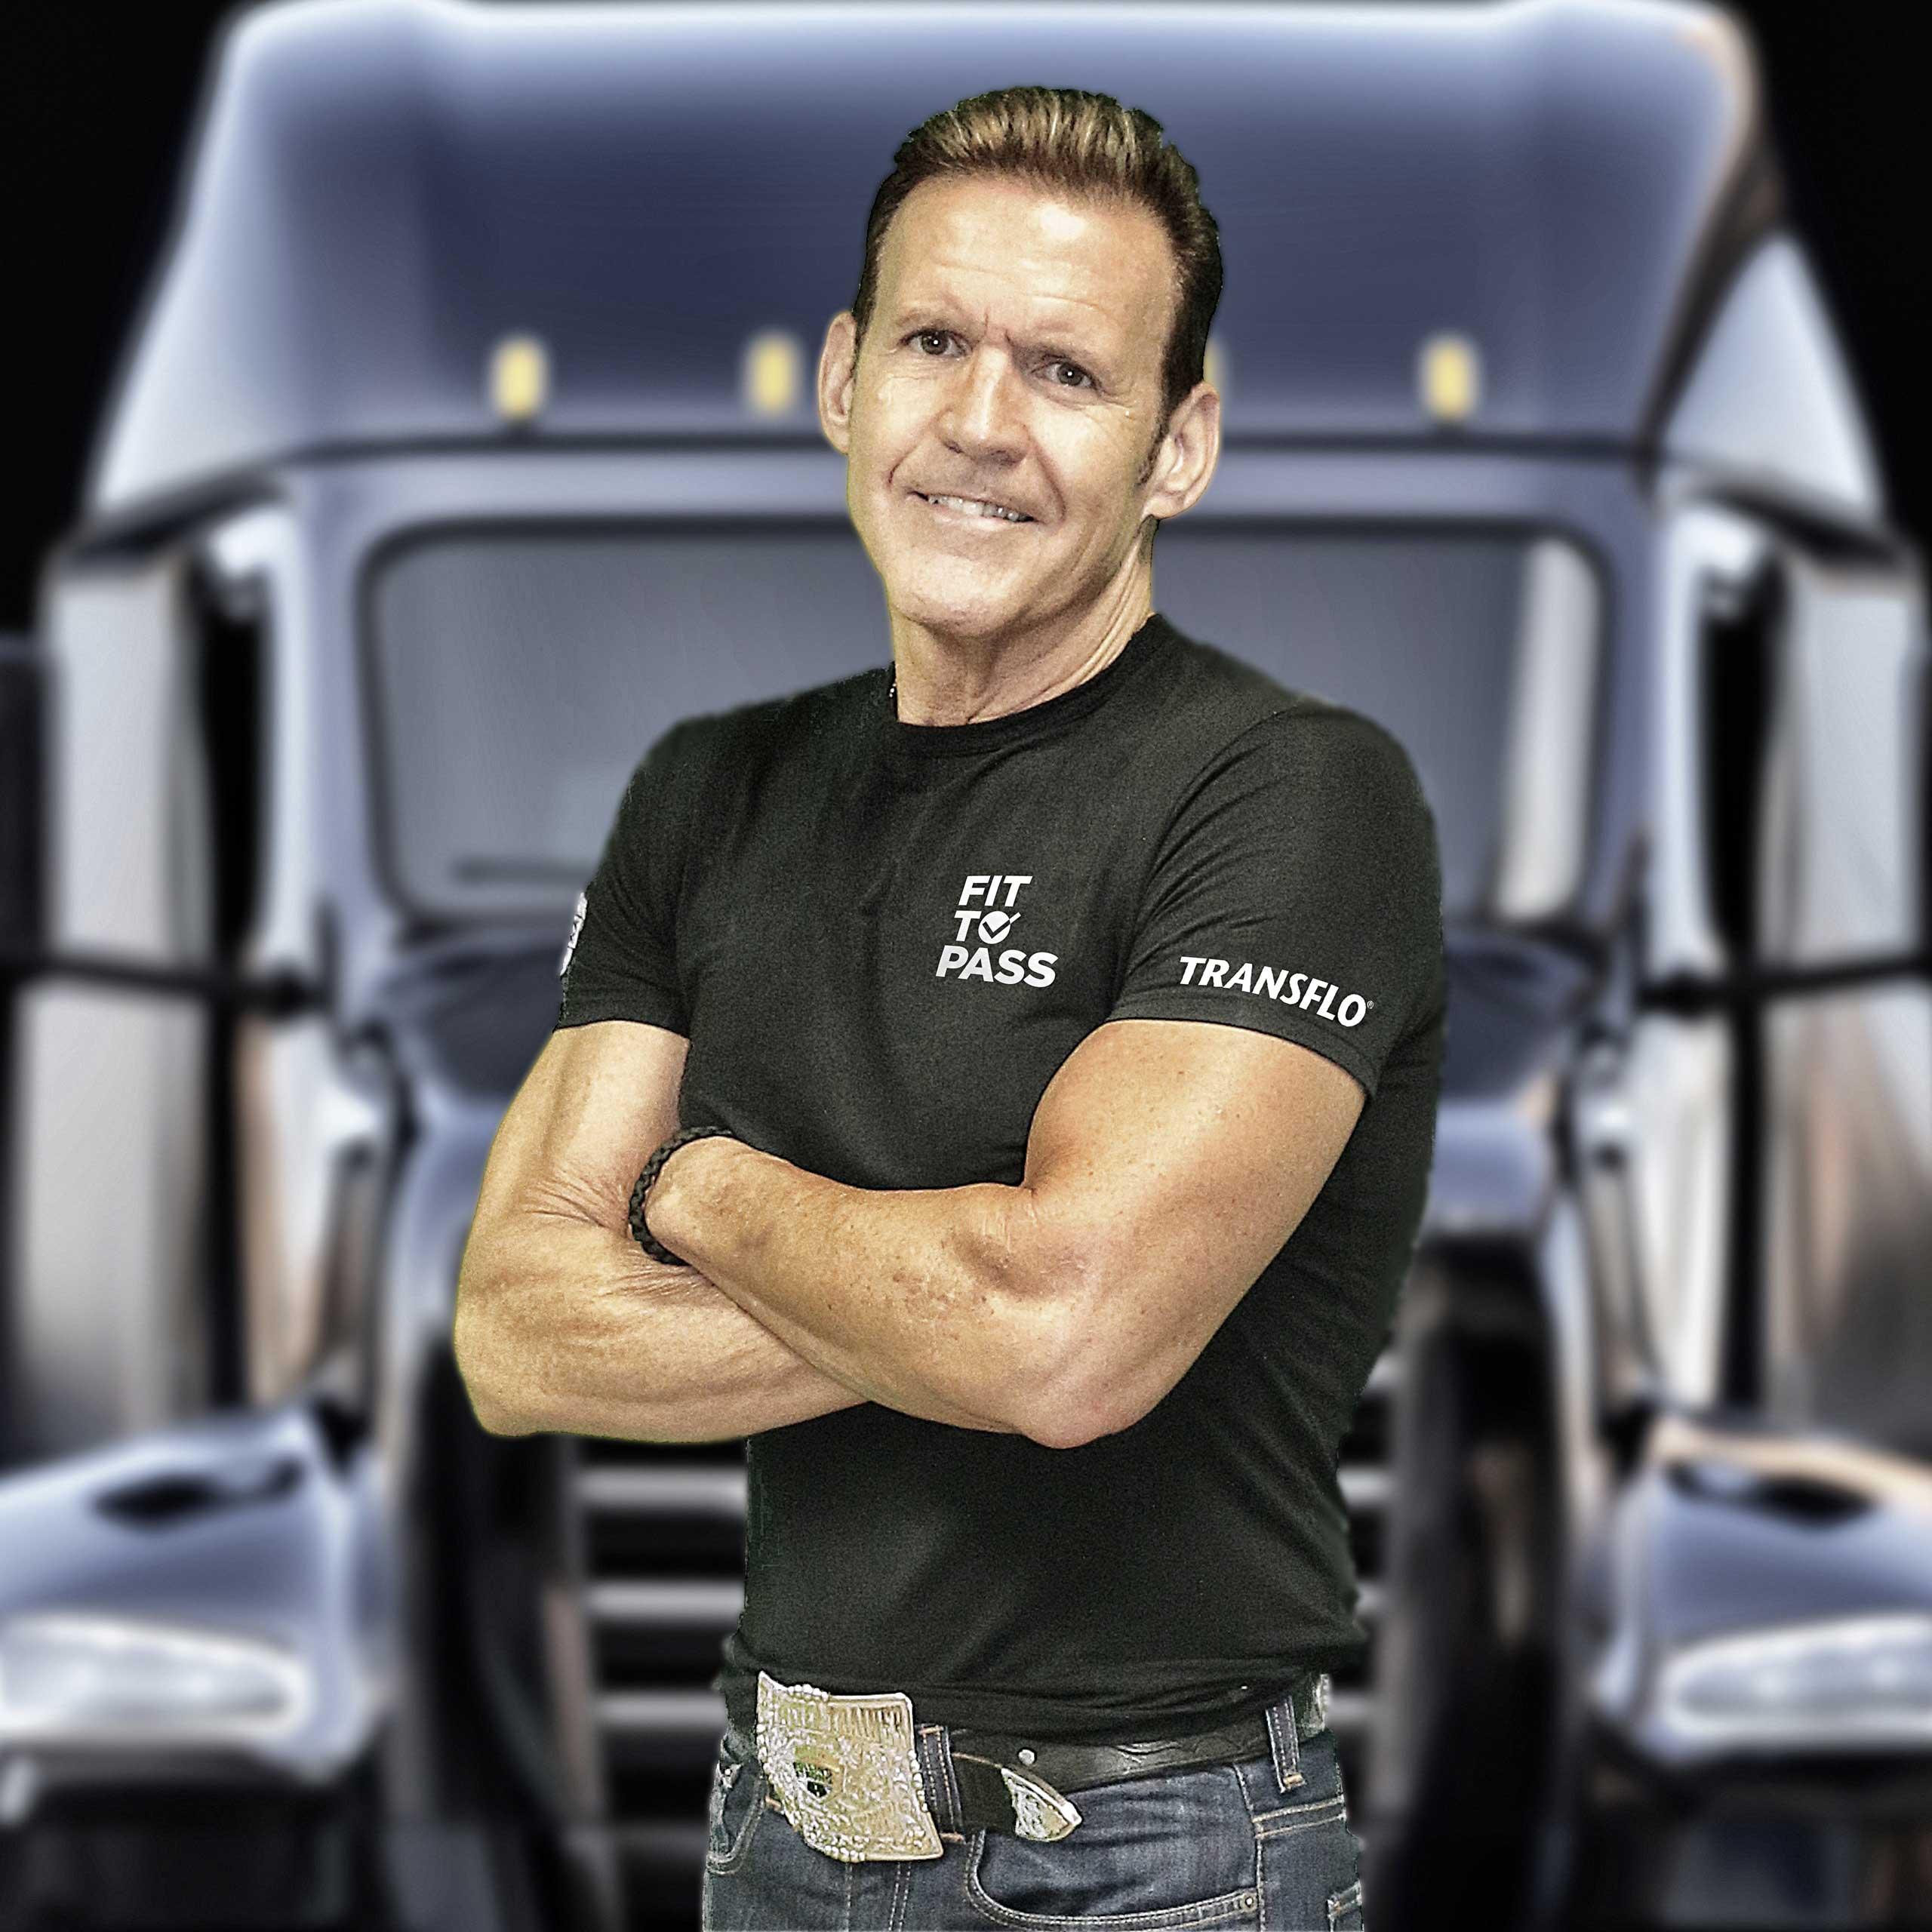 Bob Perry - trucker trainer